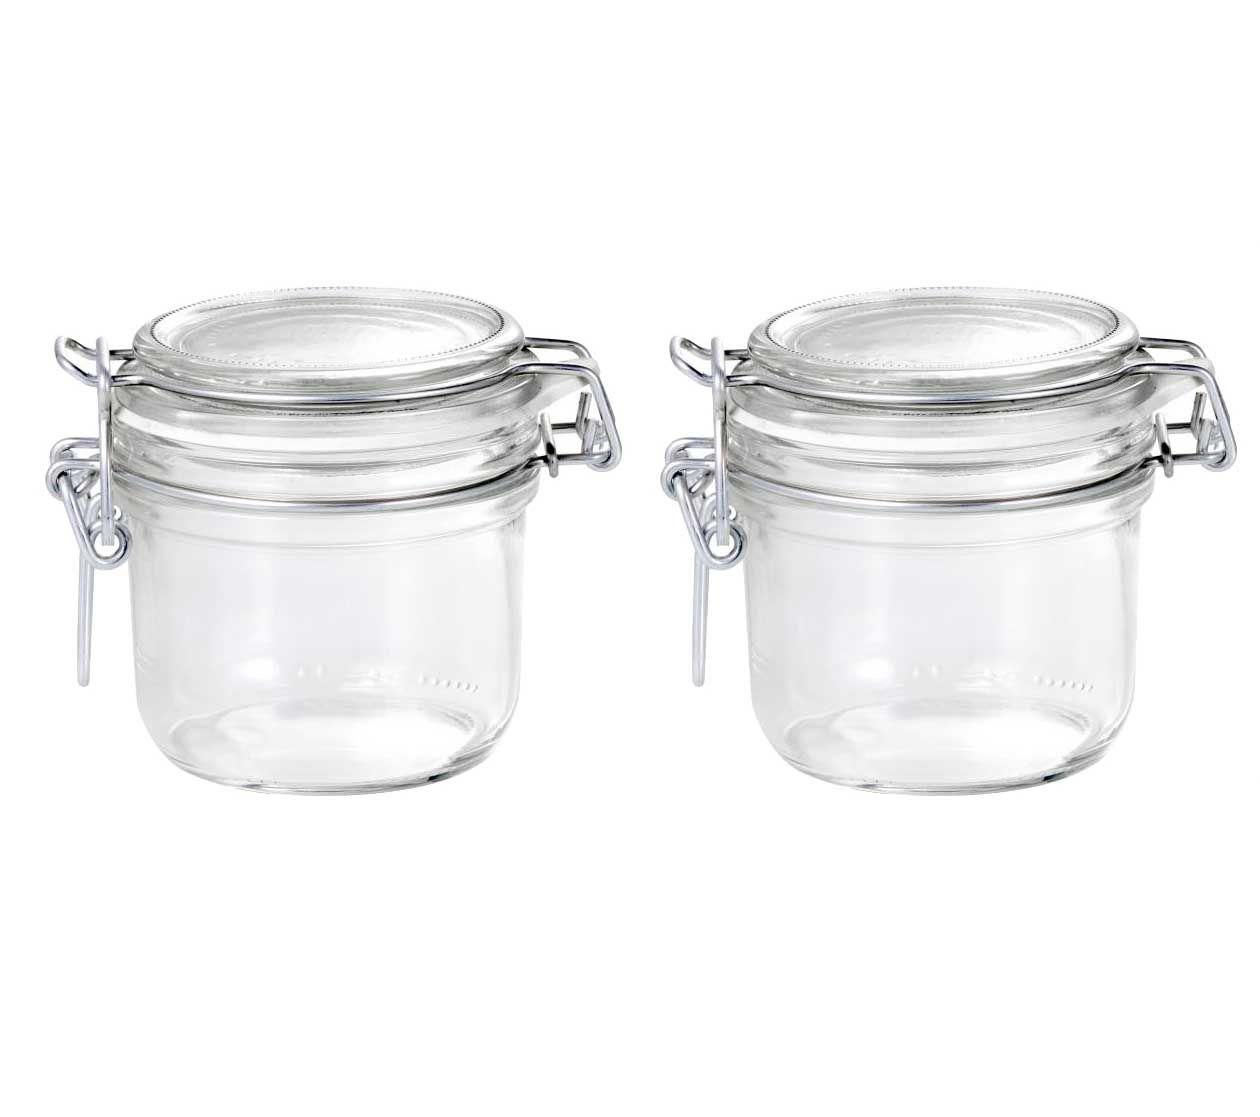 Conj 2 Pote de vidro hermético Fido Terrina 200 ml Ø 83 mm